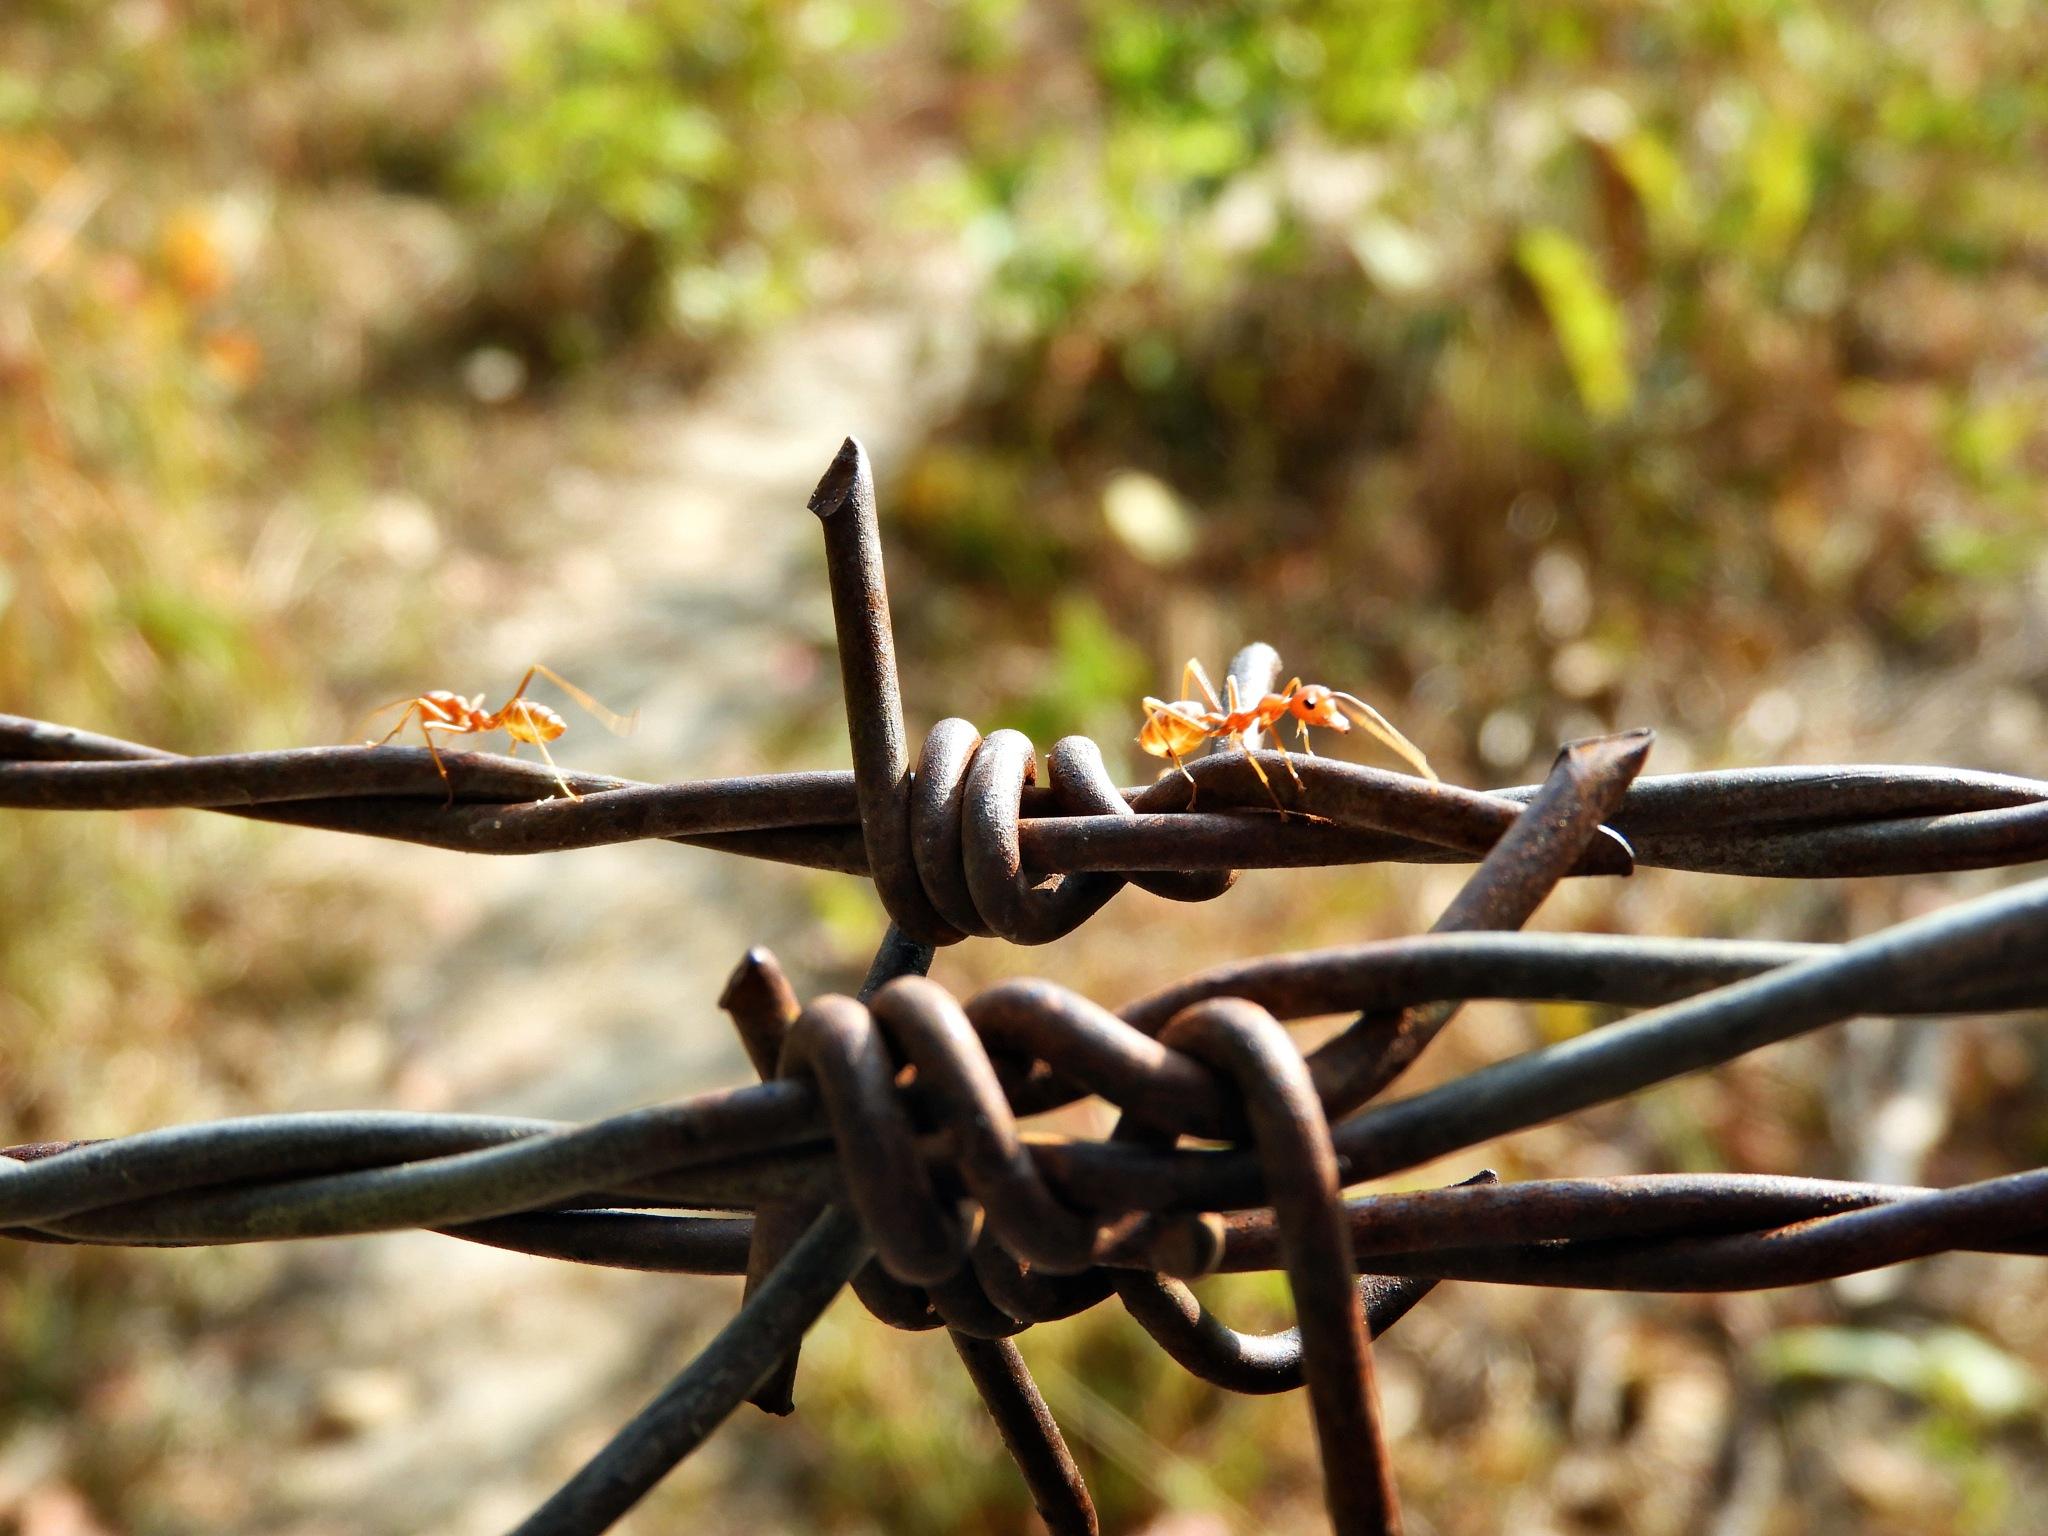 red ants by Henny van Broekhoven